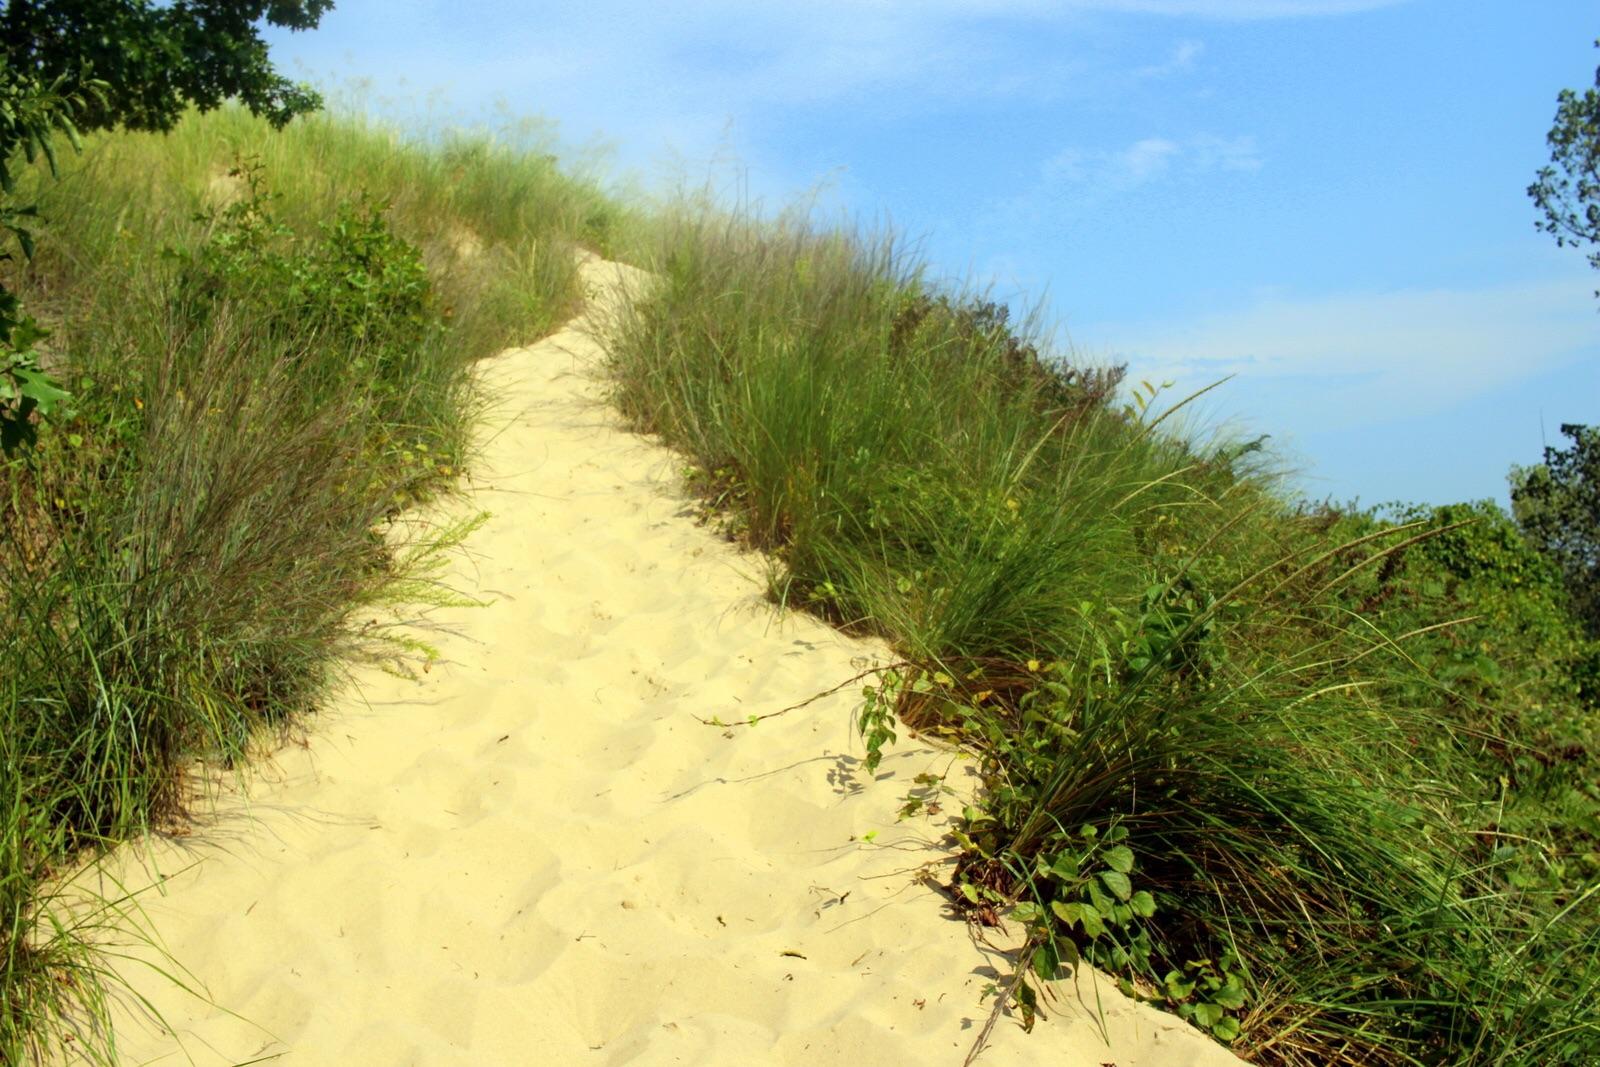 Ascending a dune.